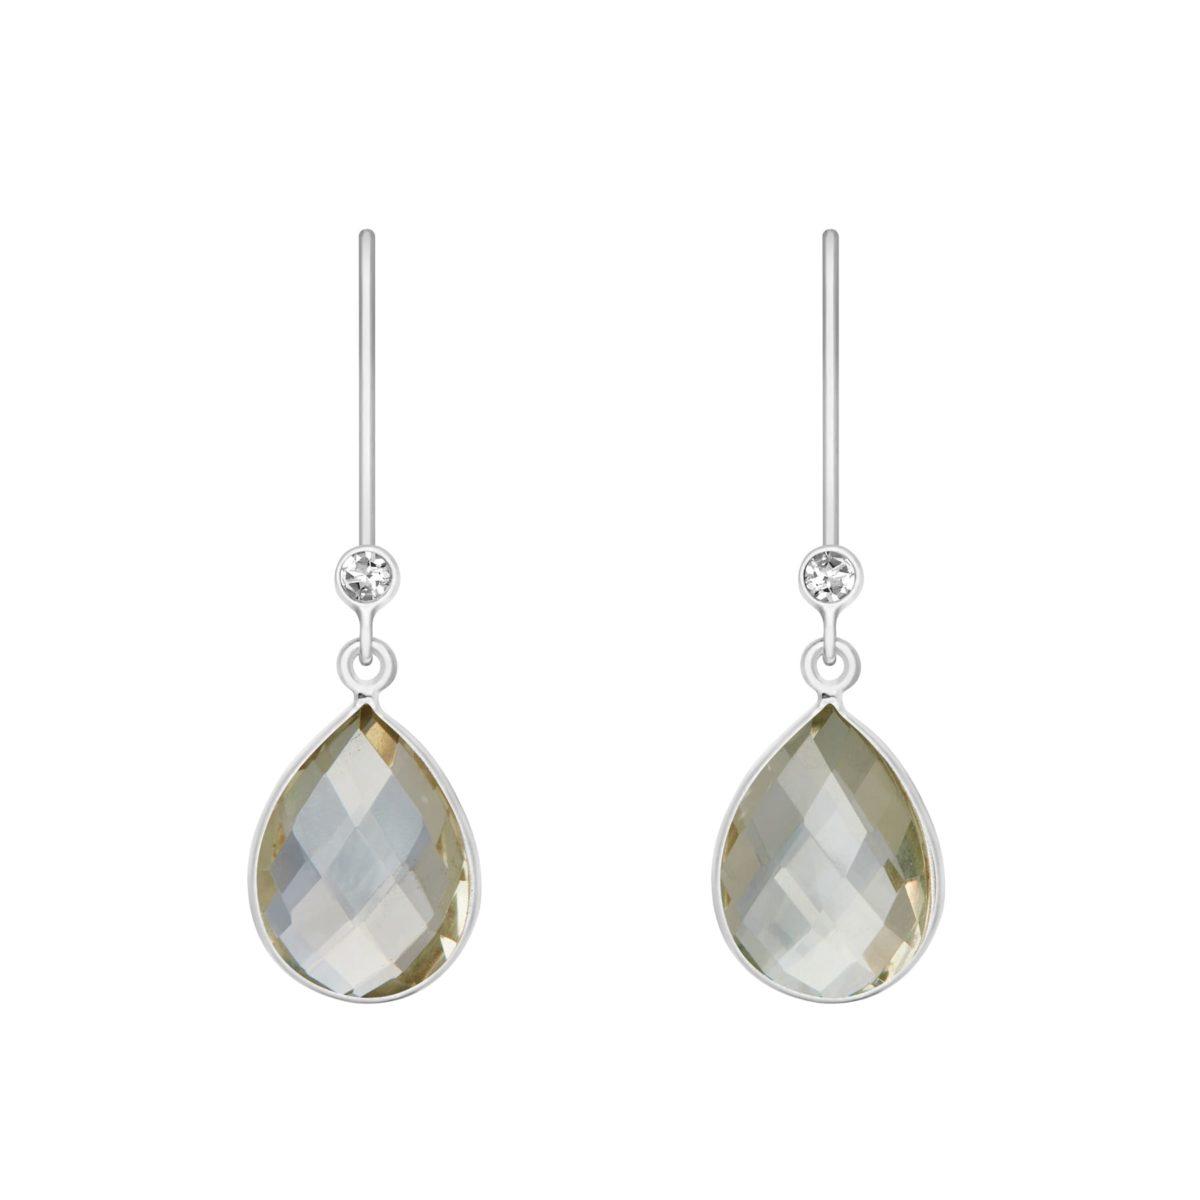 Shakara Jewellery, droplet-collectio-green-amethyst dangle earring.